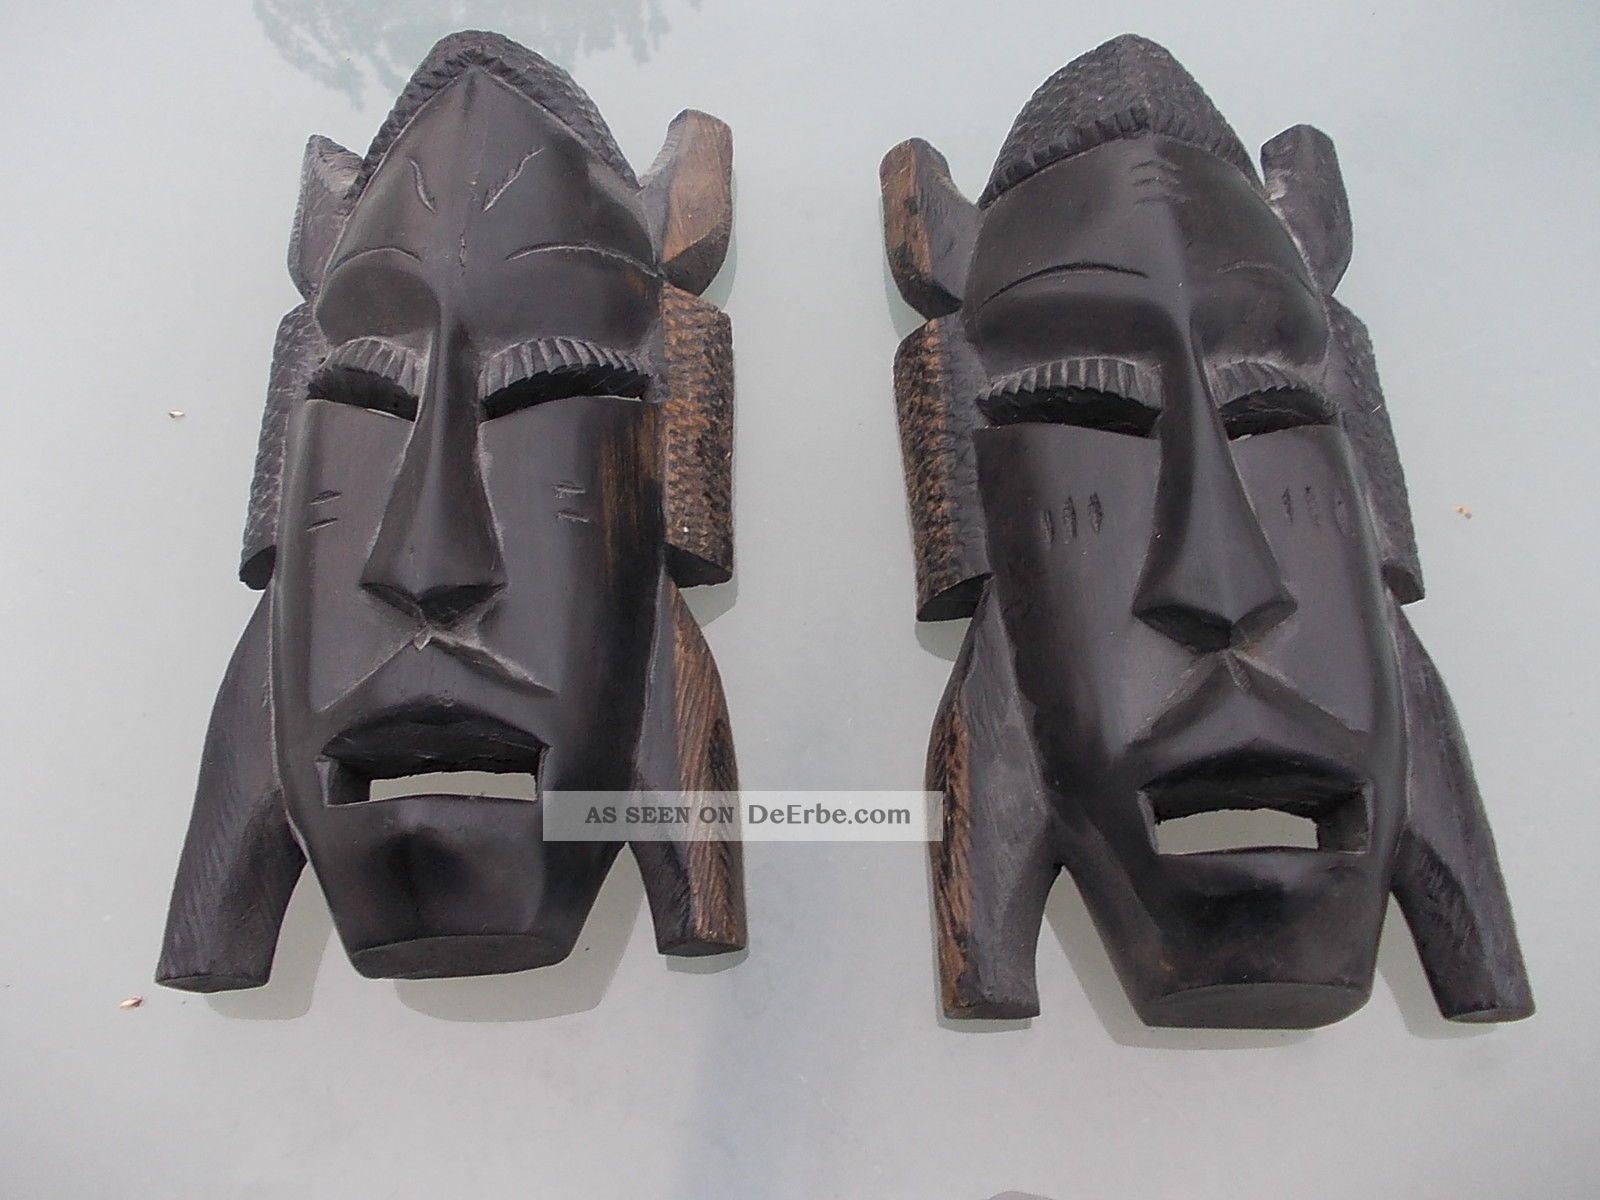 2 afrikanische masken. Black Bedroom Furniture Sets. Home Design Ideas